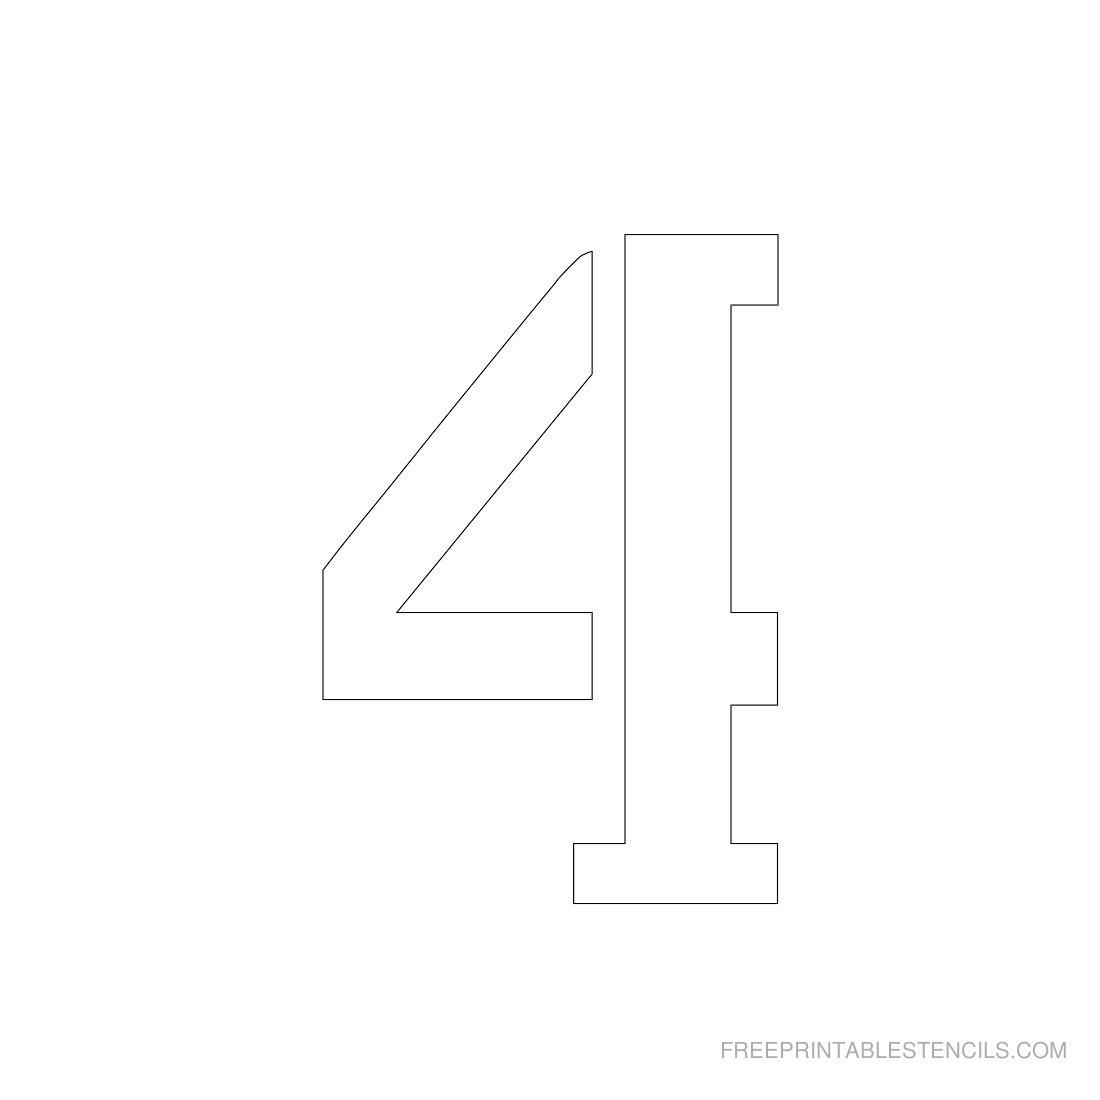 Printable 3 Inch Number Stencils 1-10 | Free Printable Stencils - Free Printable 3 Inch Number Stencils